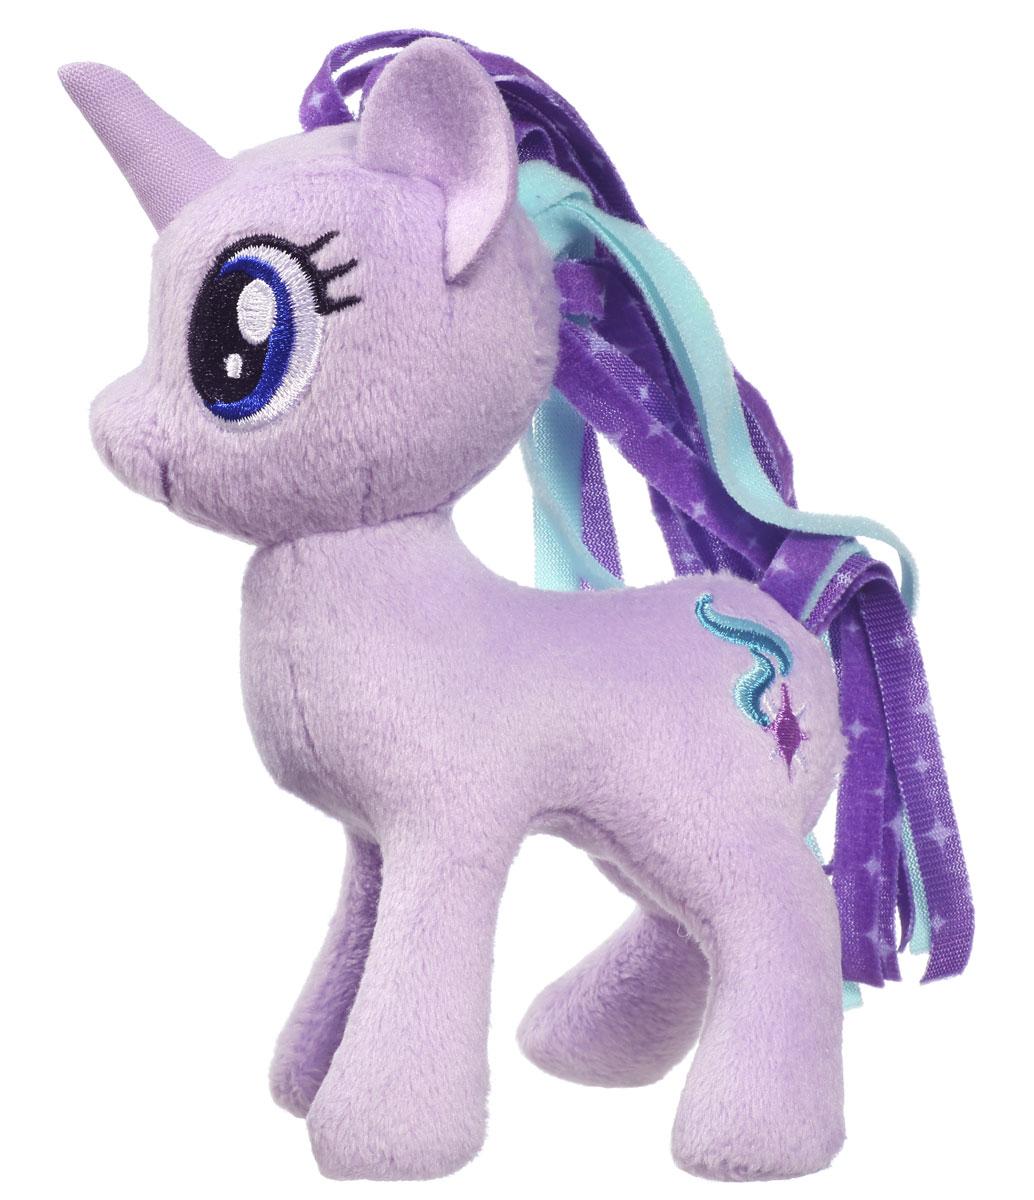 My Little Pony Мягкая игрушка Пони Starlight Glimmer 13 см